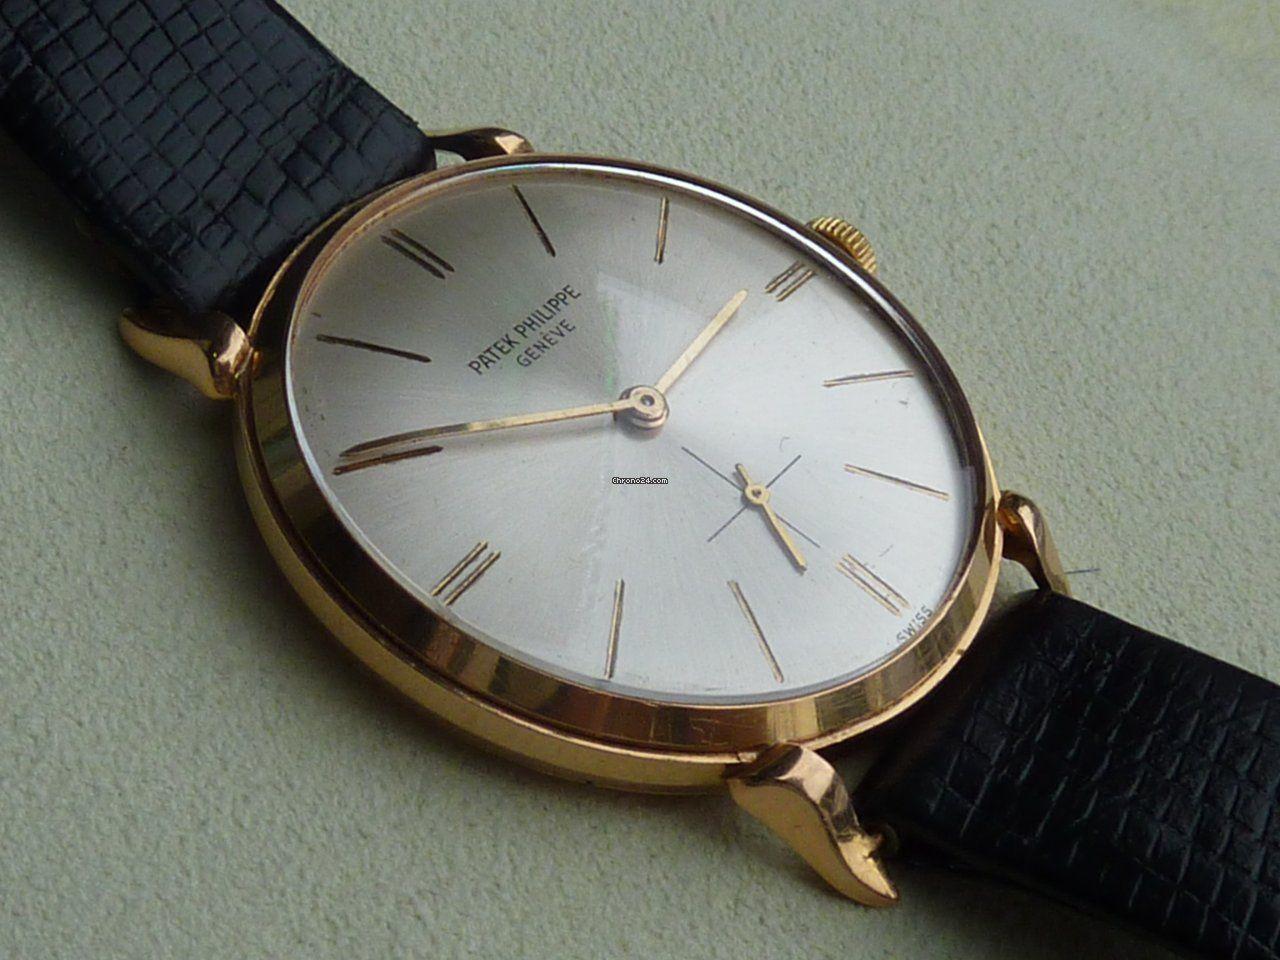 Patek Philippe Calatrava 18k Rose Gold Omg I Love It Timex Uhren Uhren Neue Uhren